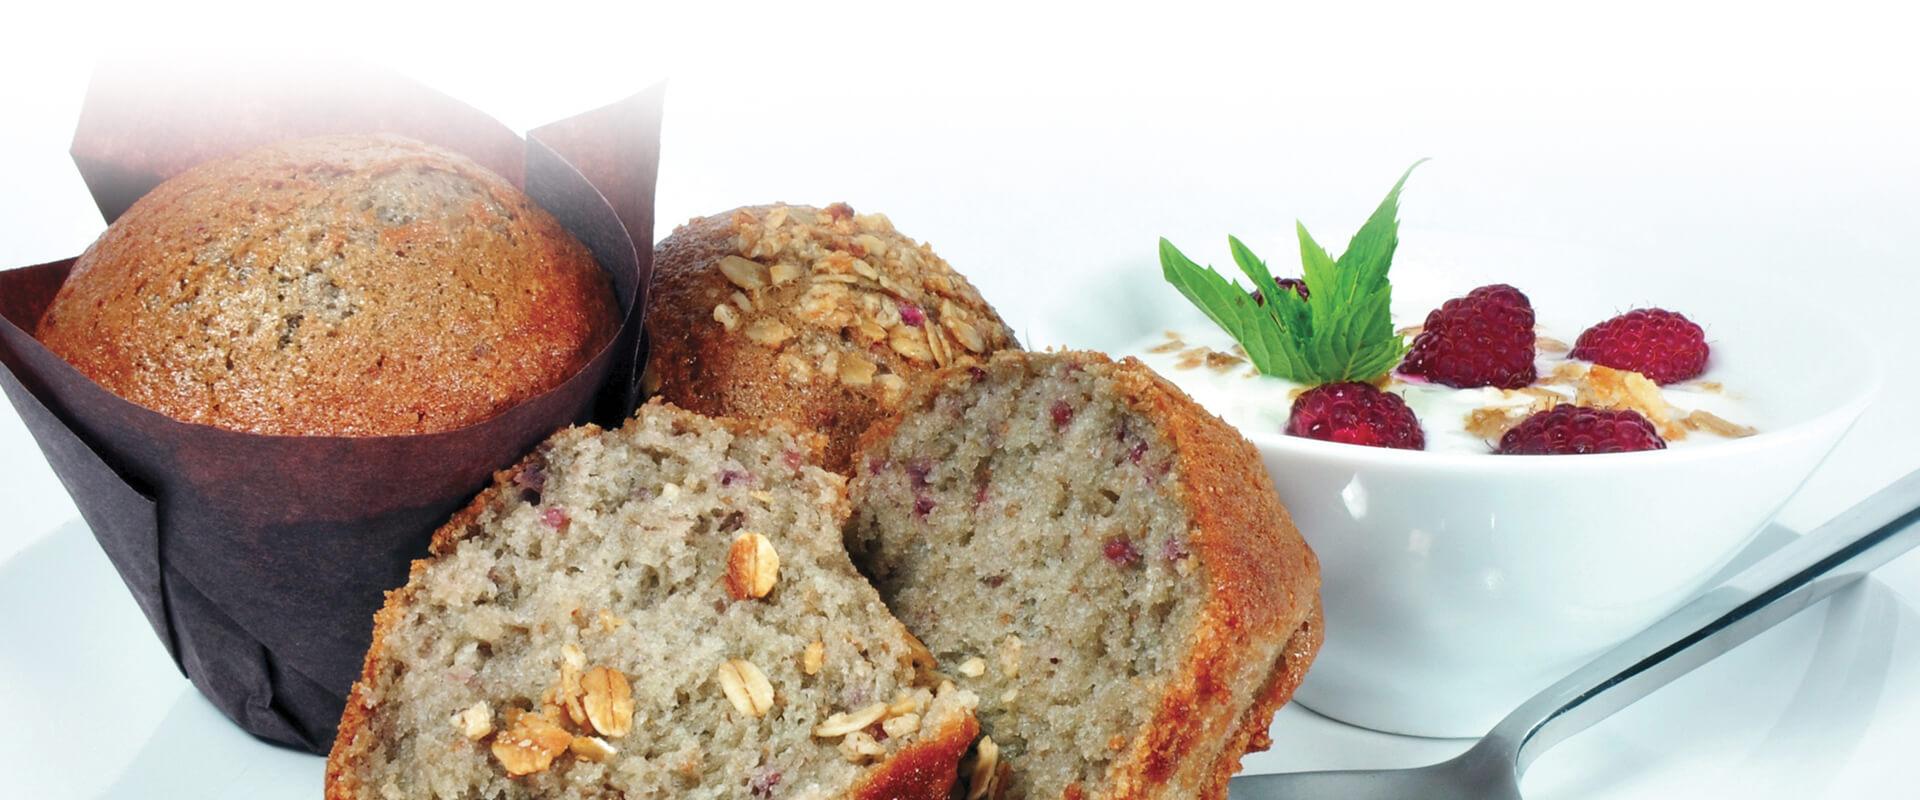 Bannière Pâte à muffins gourmet